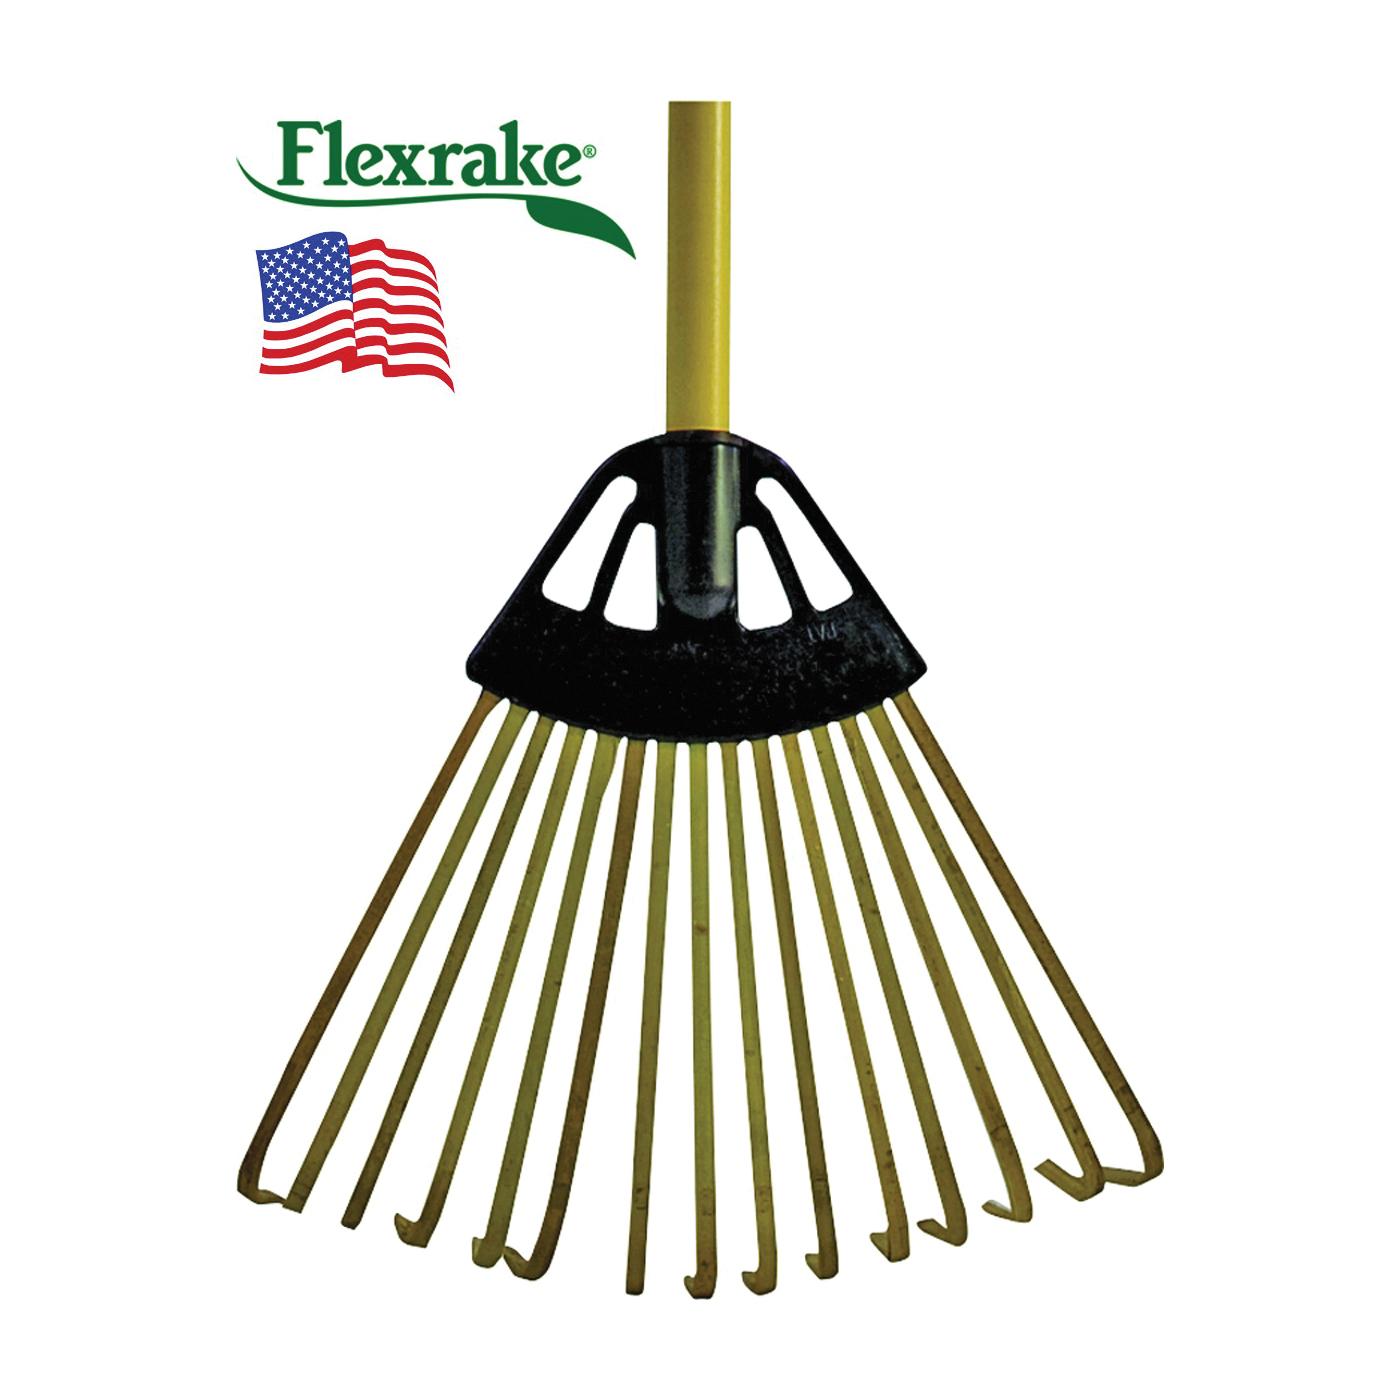 Picture of Flexrake CFP10 Leaf Rake, Bamboo Tine, Hardwood Handle, 36 in L Handle